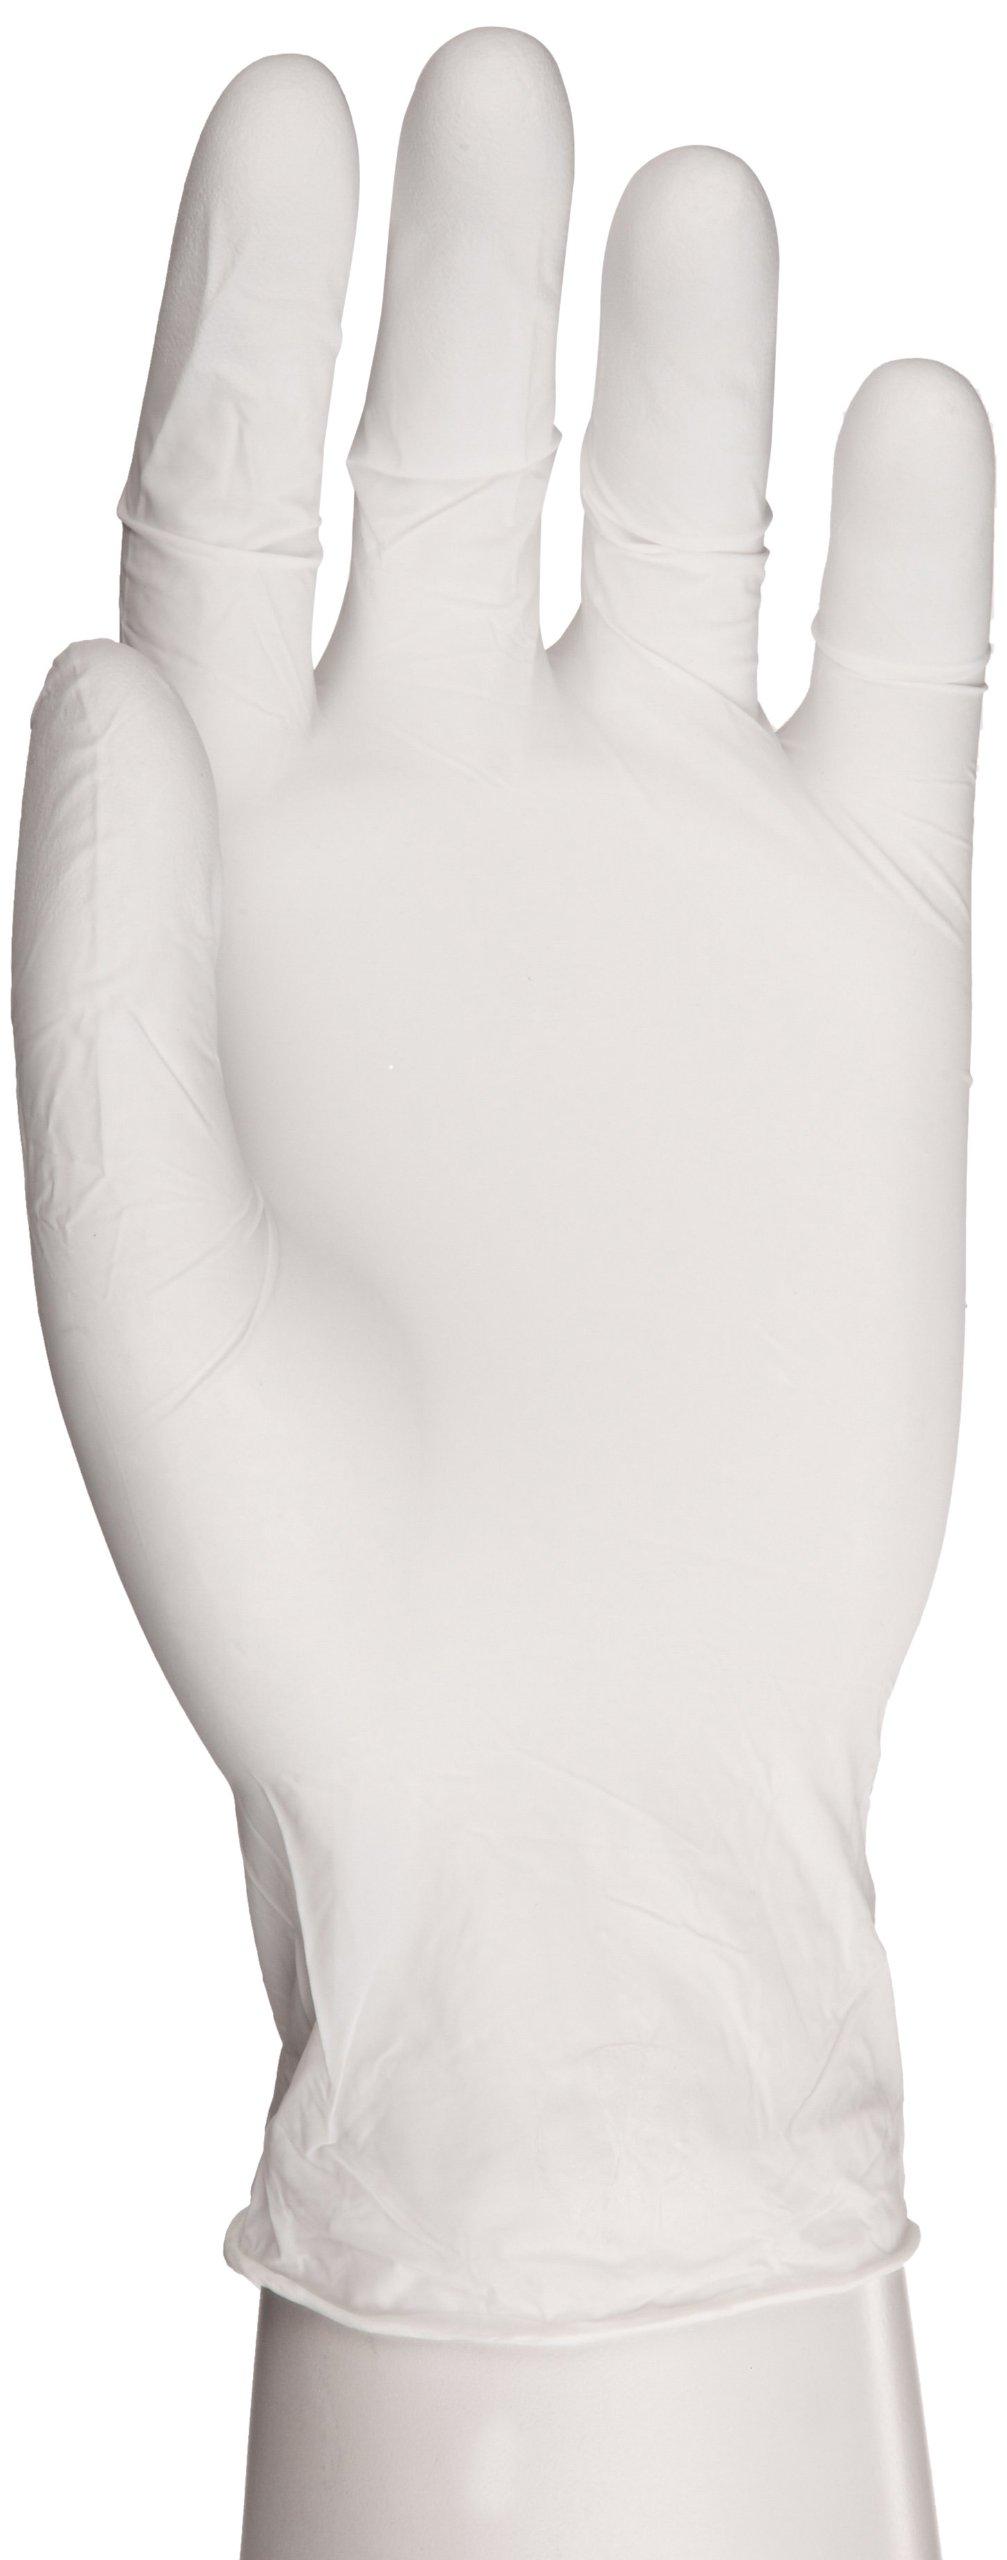 Aurelia Quest Nitrile Glove, Powder Free, 9.4'' Length, 3.5 mils Thick, X-Large (Pack of 1000) by Aurelia (Image #2)